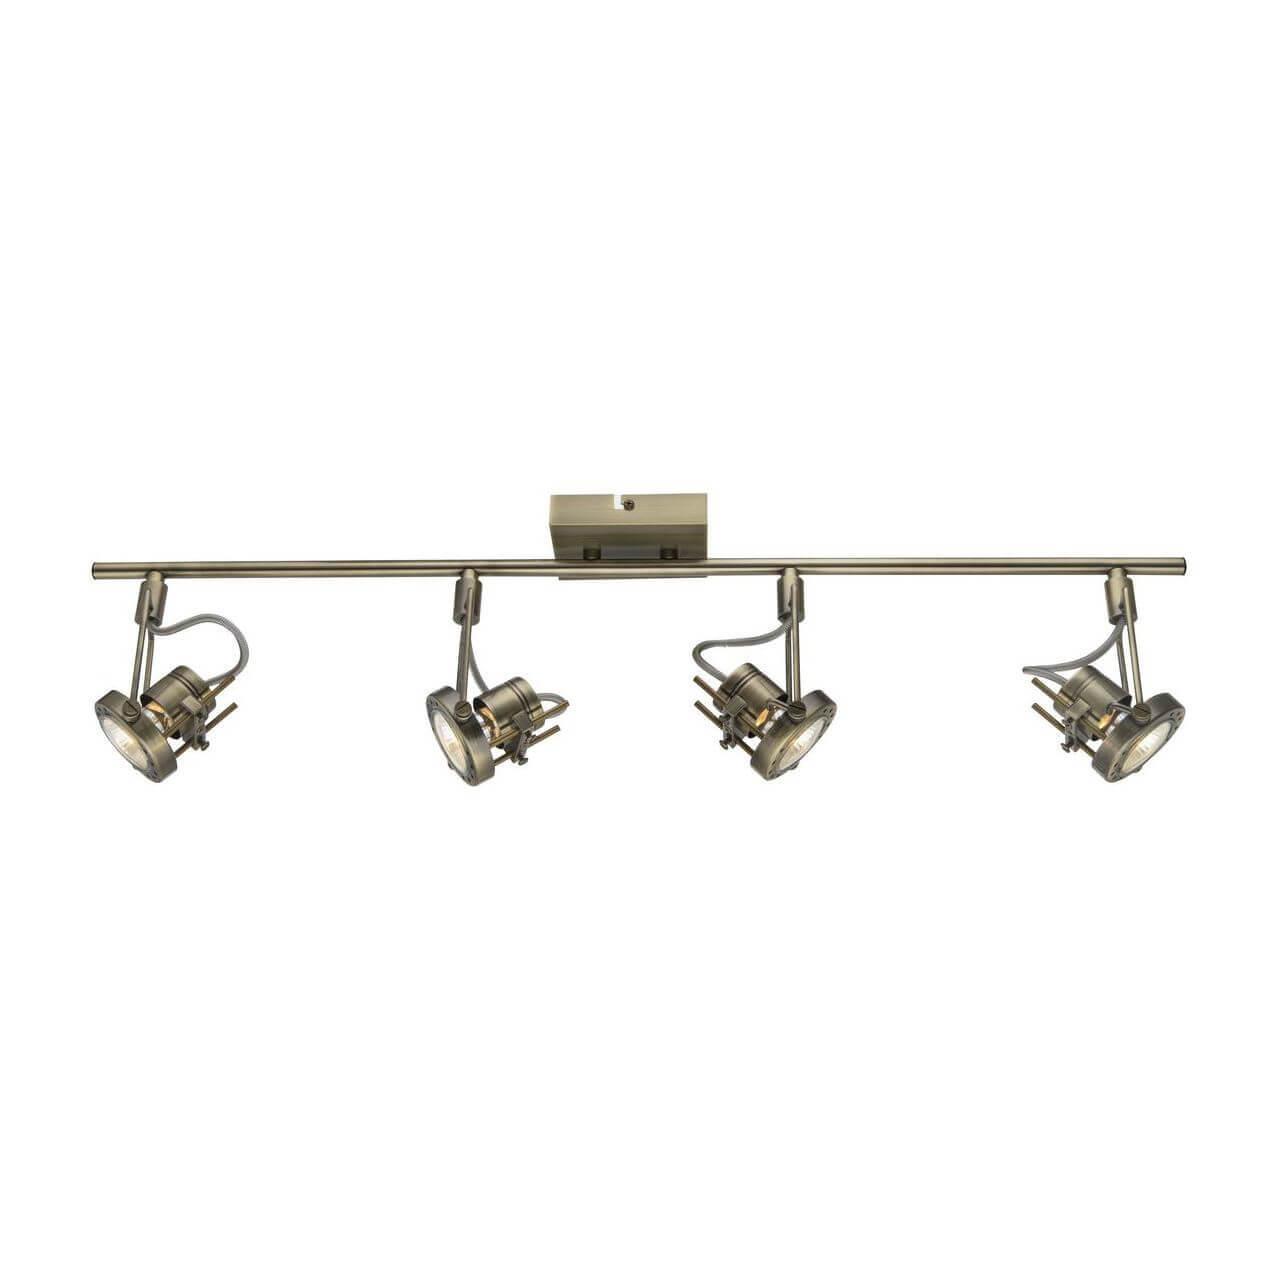 Спот Arte Lamp A4301PL-4AB 4301 недорого